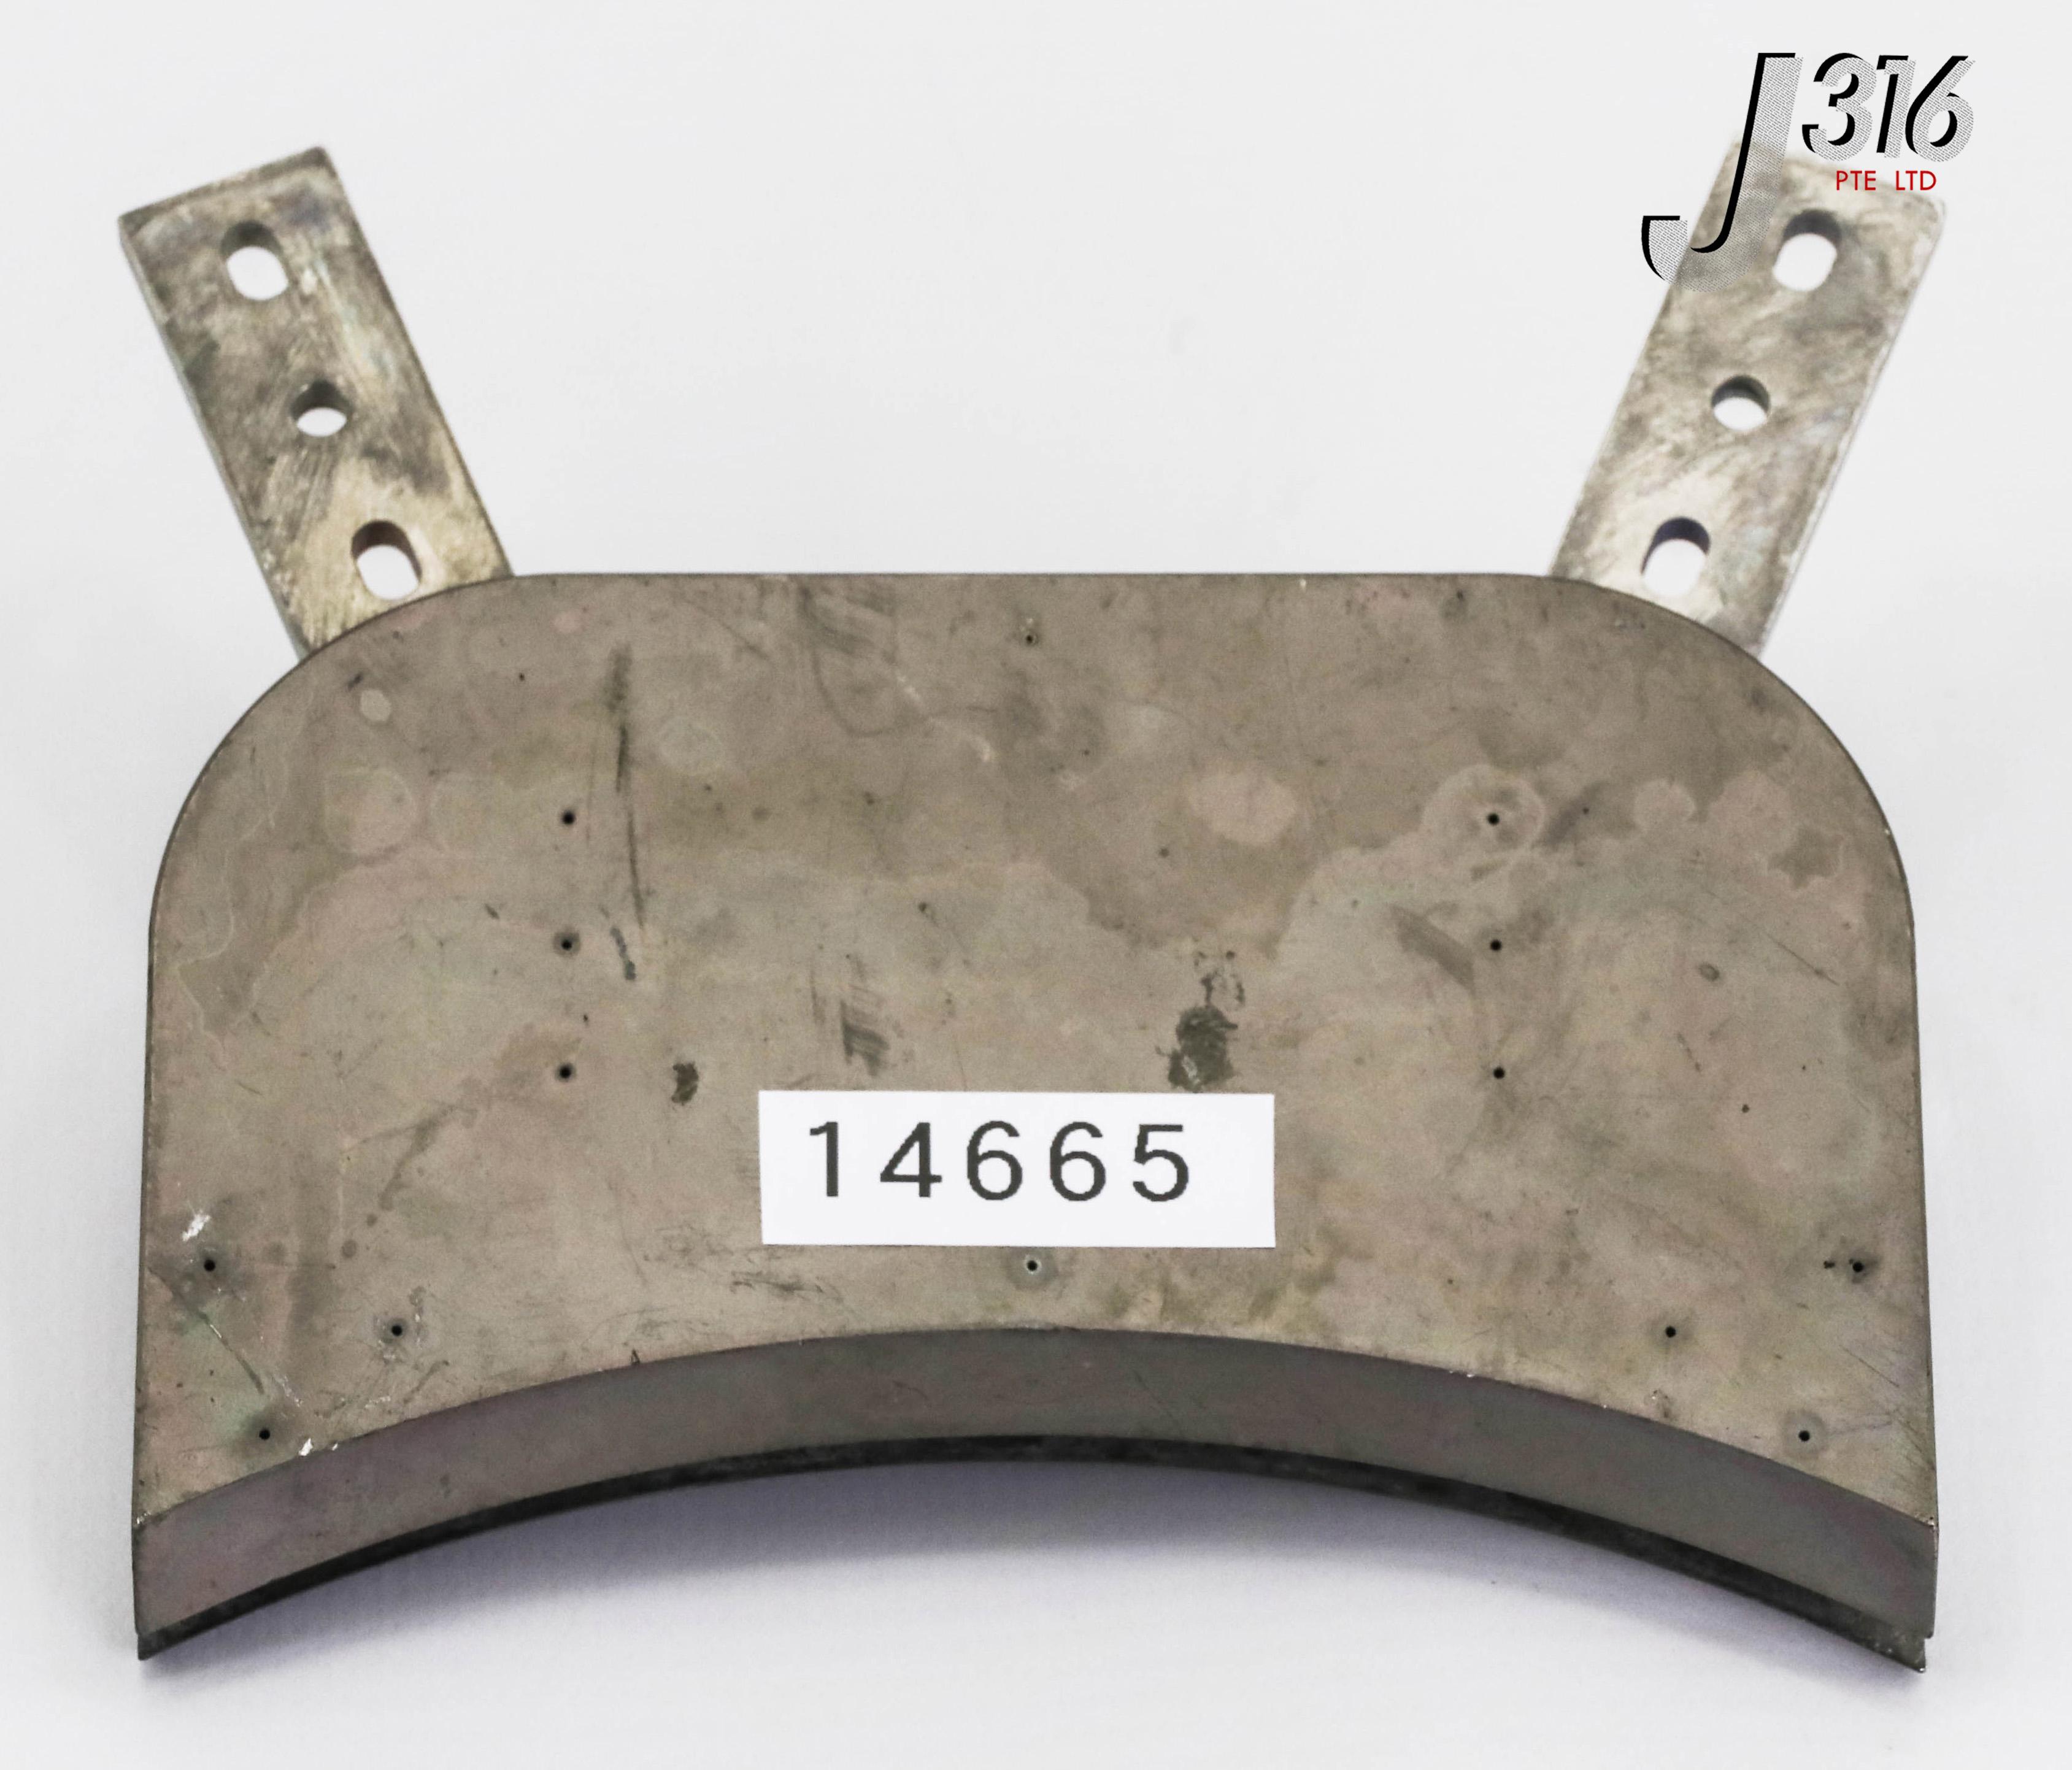 14665 APPLIED MATERIALS CLAMP 8 INCH BUFFER FROG LEG, 0020-70271,  0020-70272, PARTS 0020-21105 - J316PL VP-ASP Shopping Cart 8.00